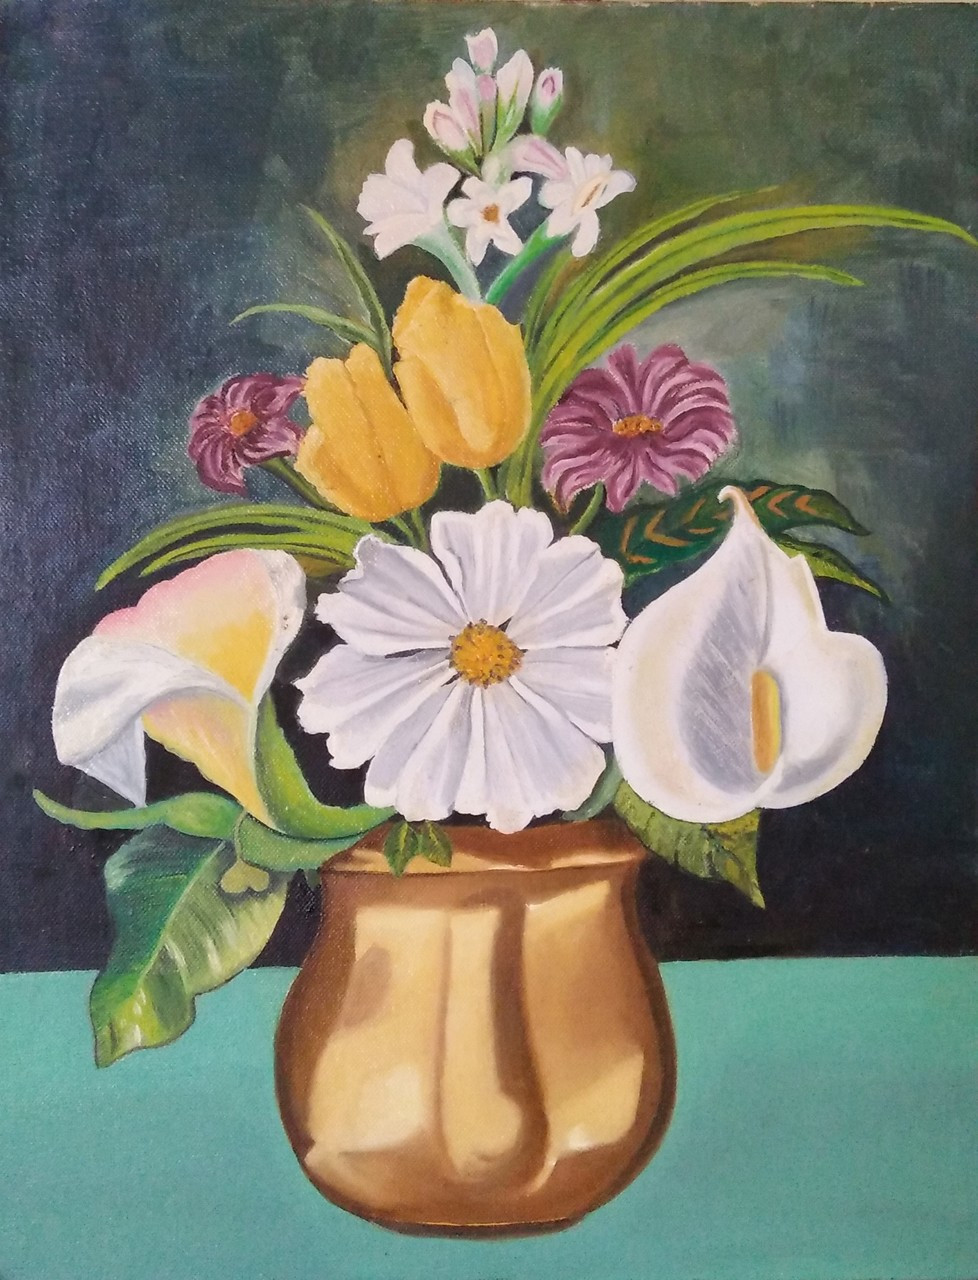 Fizdi.com & FLOWERS IN VASE (ART_3041_20736) - Handpainted Art Painting - 14in X 18in